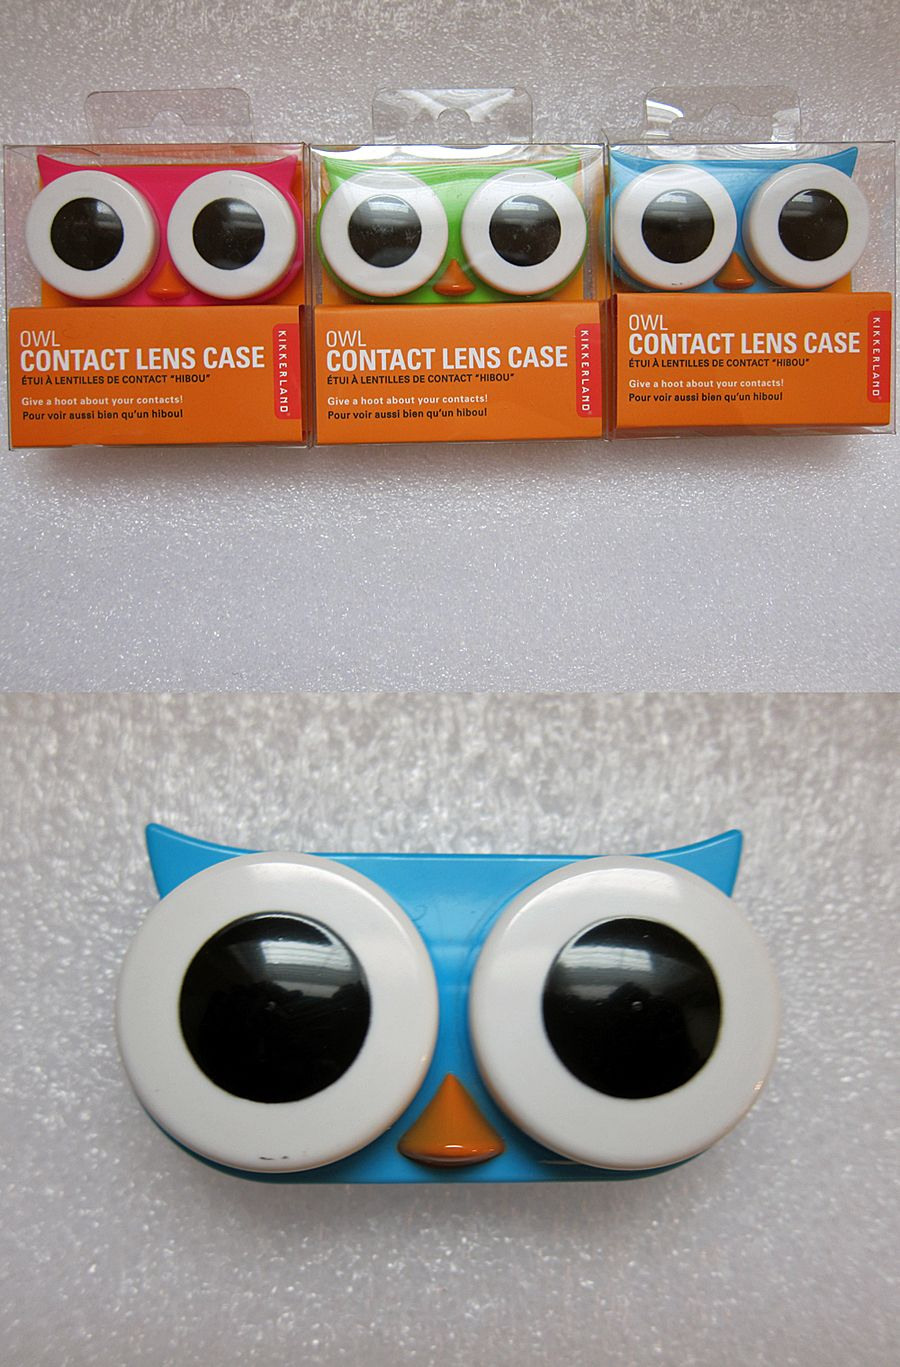 68630f3f65e23 Kikkerland owl contact lens lenses kawaii case pink green blue ...